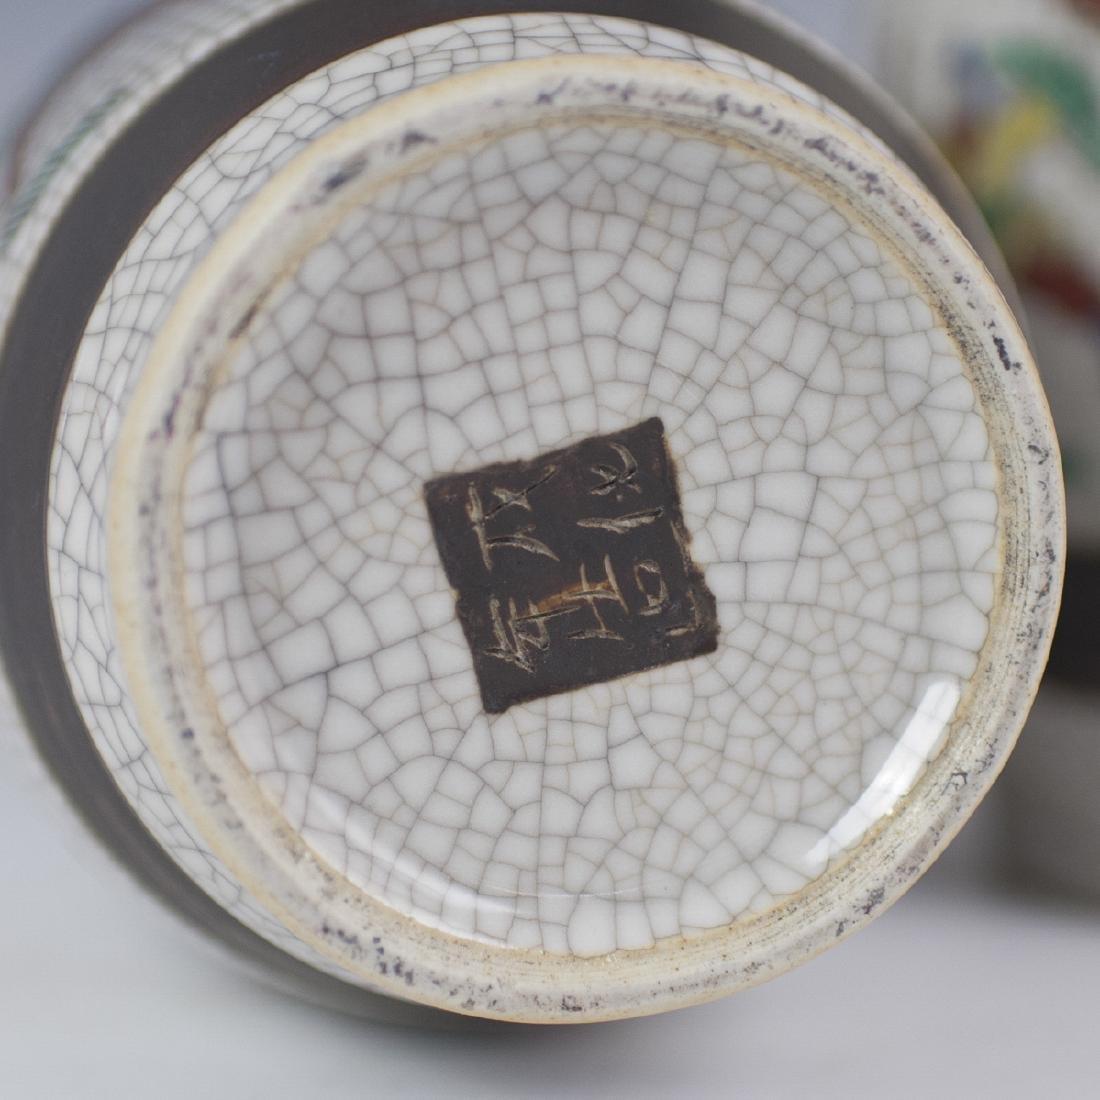 Chinese Crackle Glazed Warrior Vases - 3